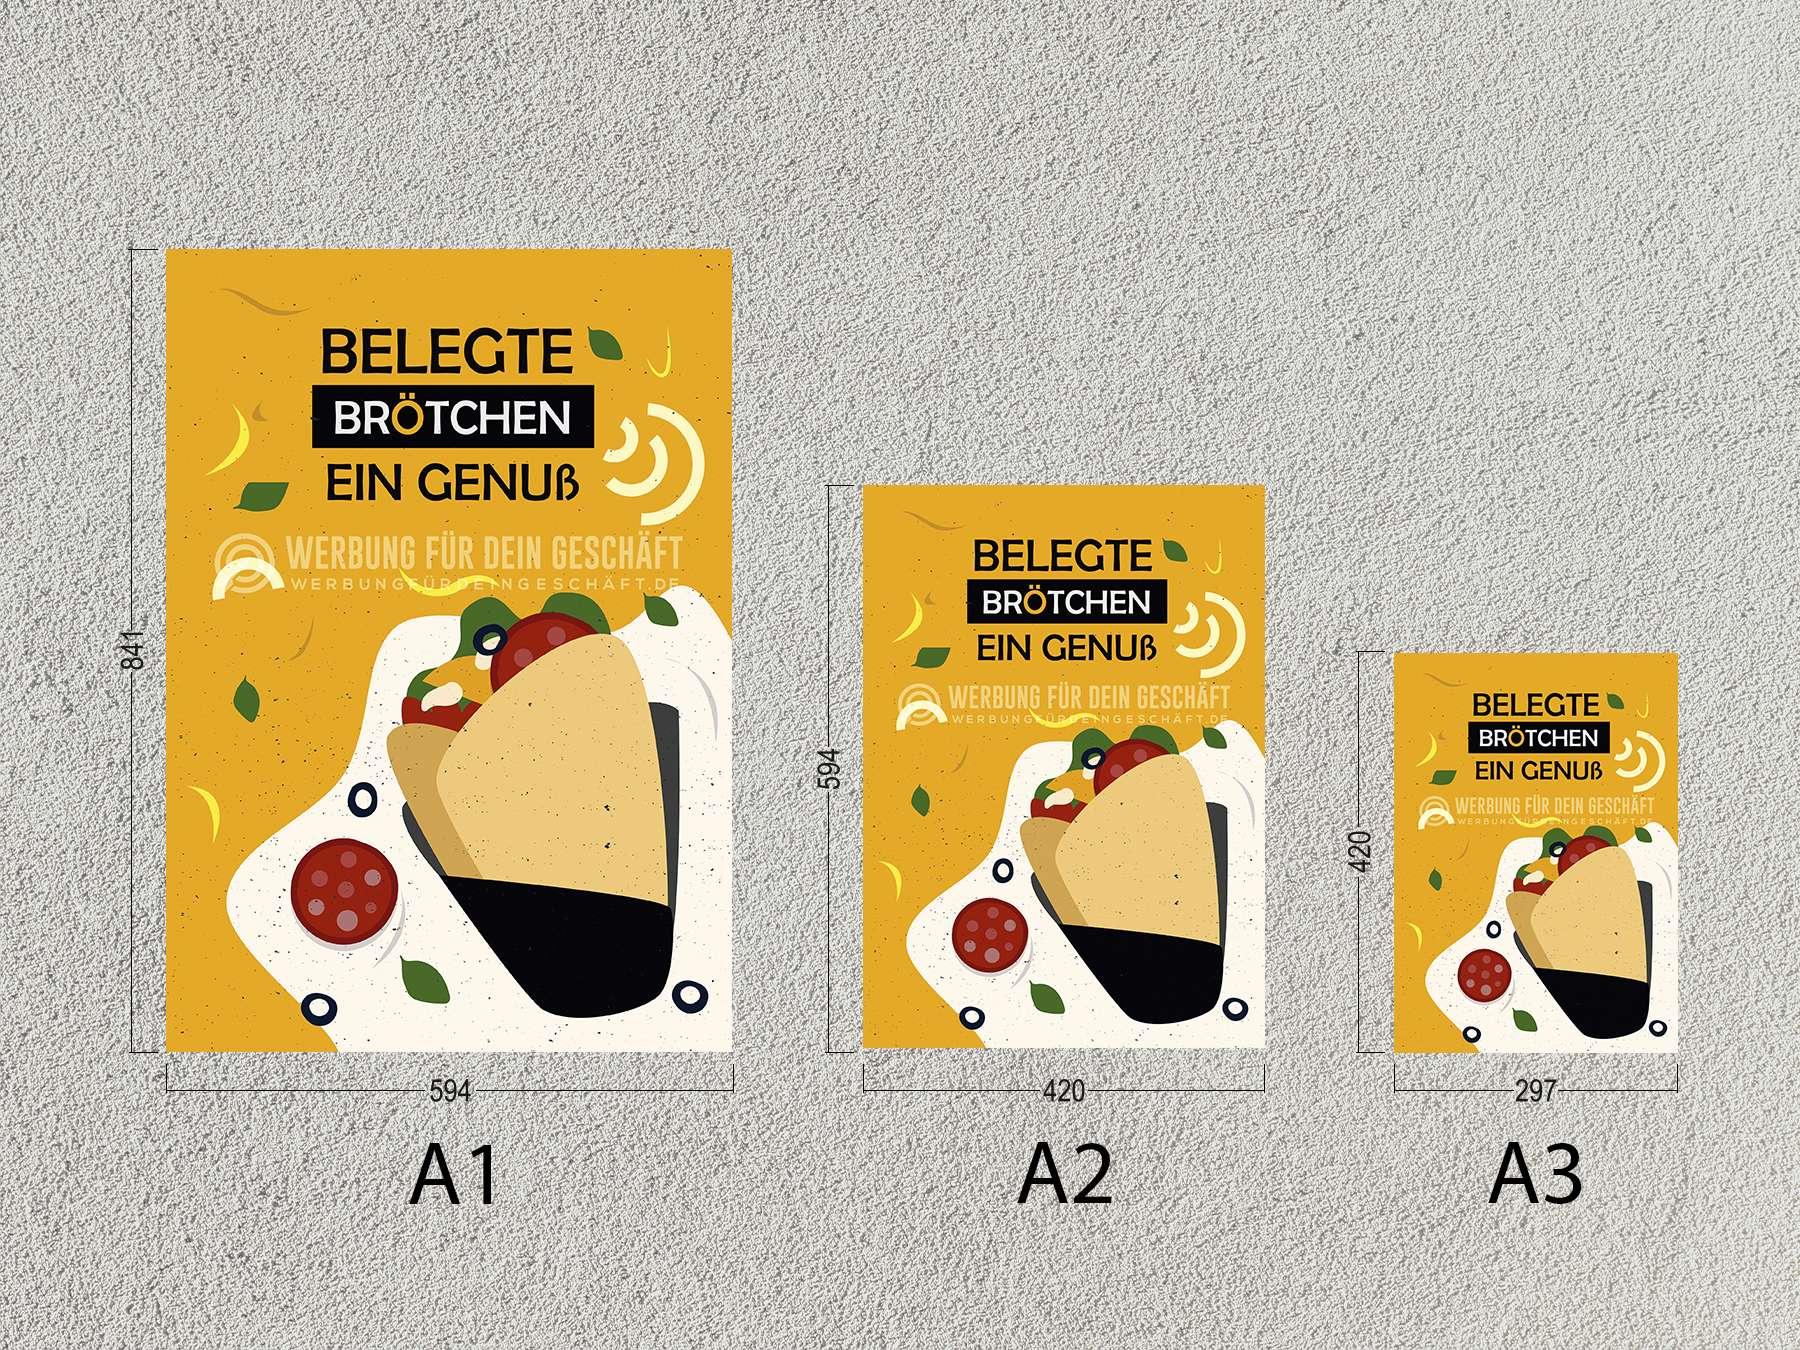 2 x belegte Brötchen Frühstück Poster Plakate DIN A1 Werbung Kundenstopper